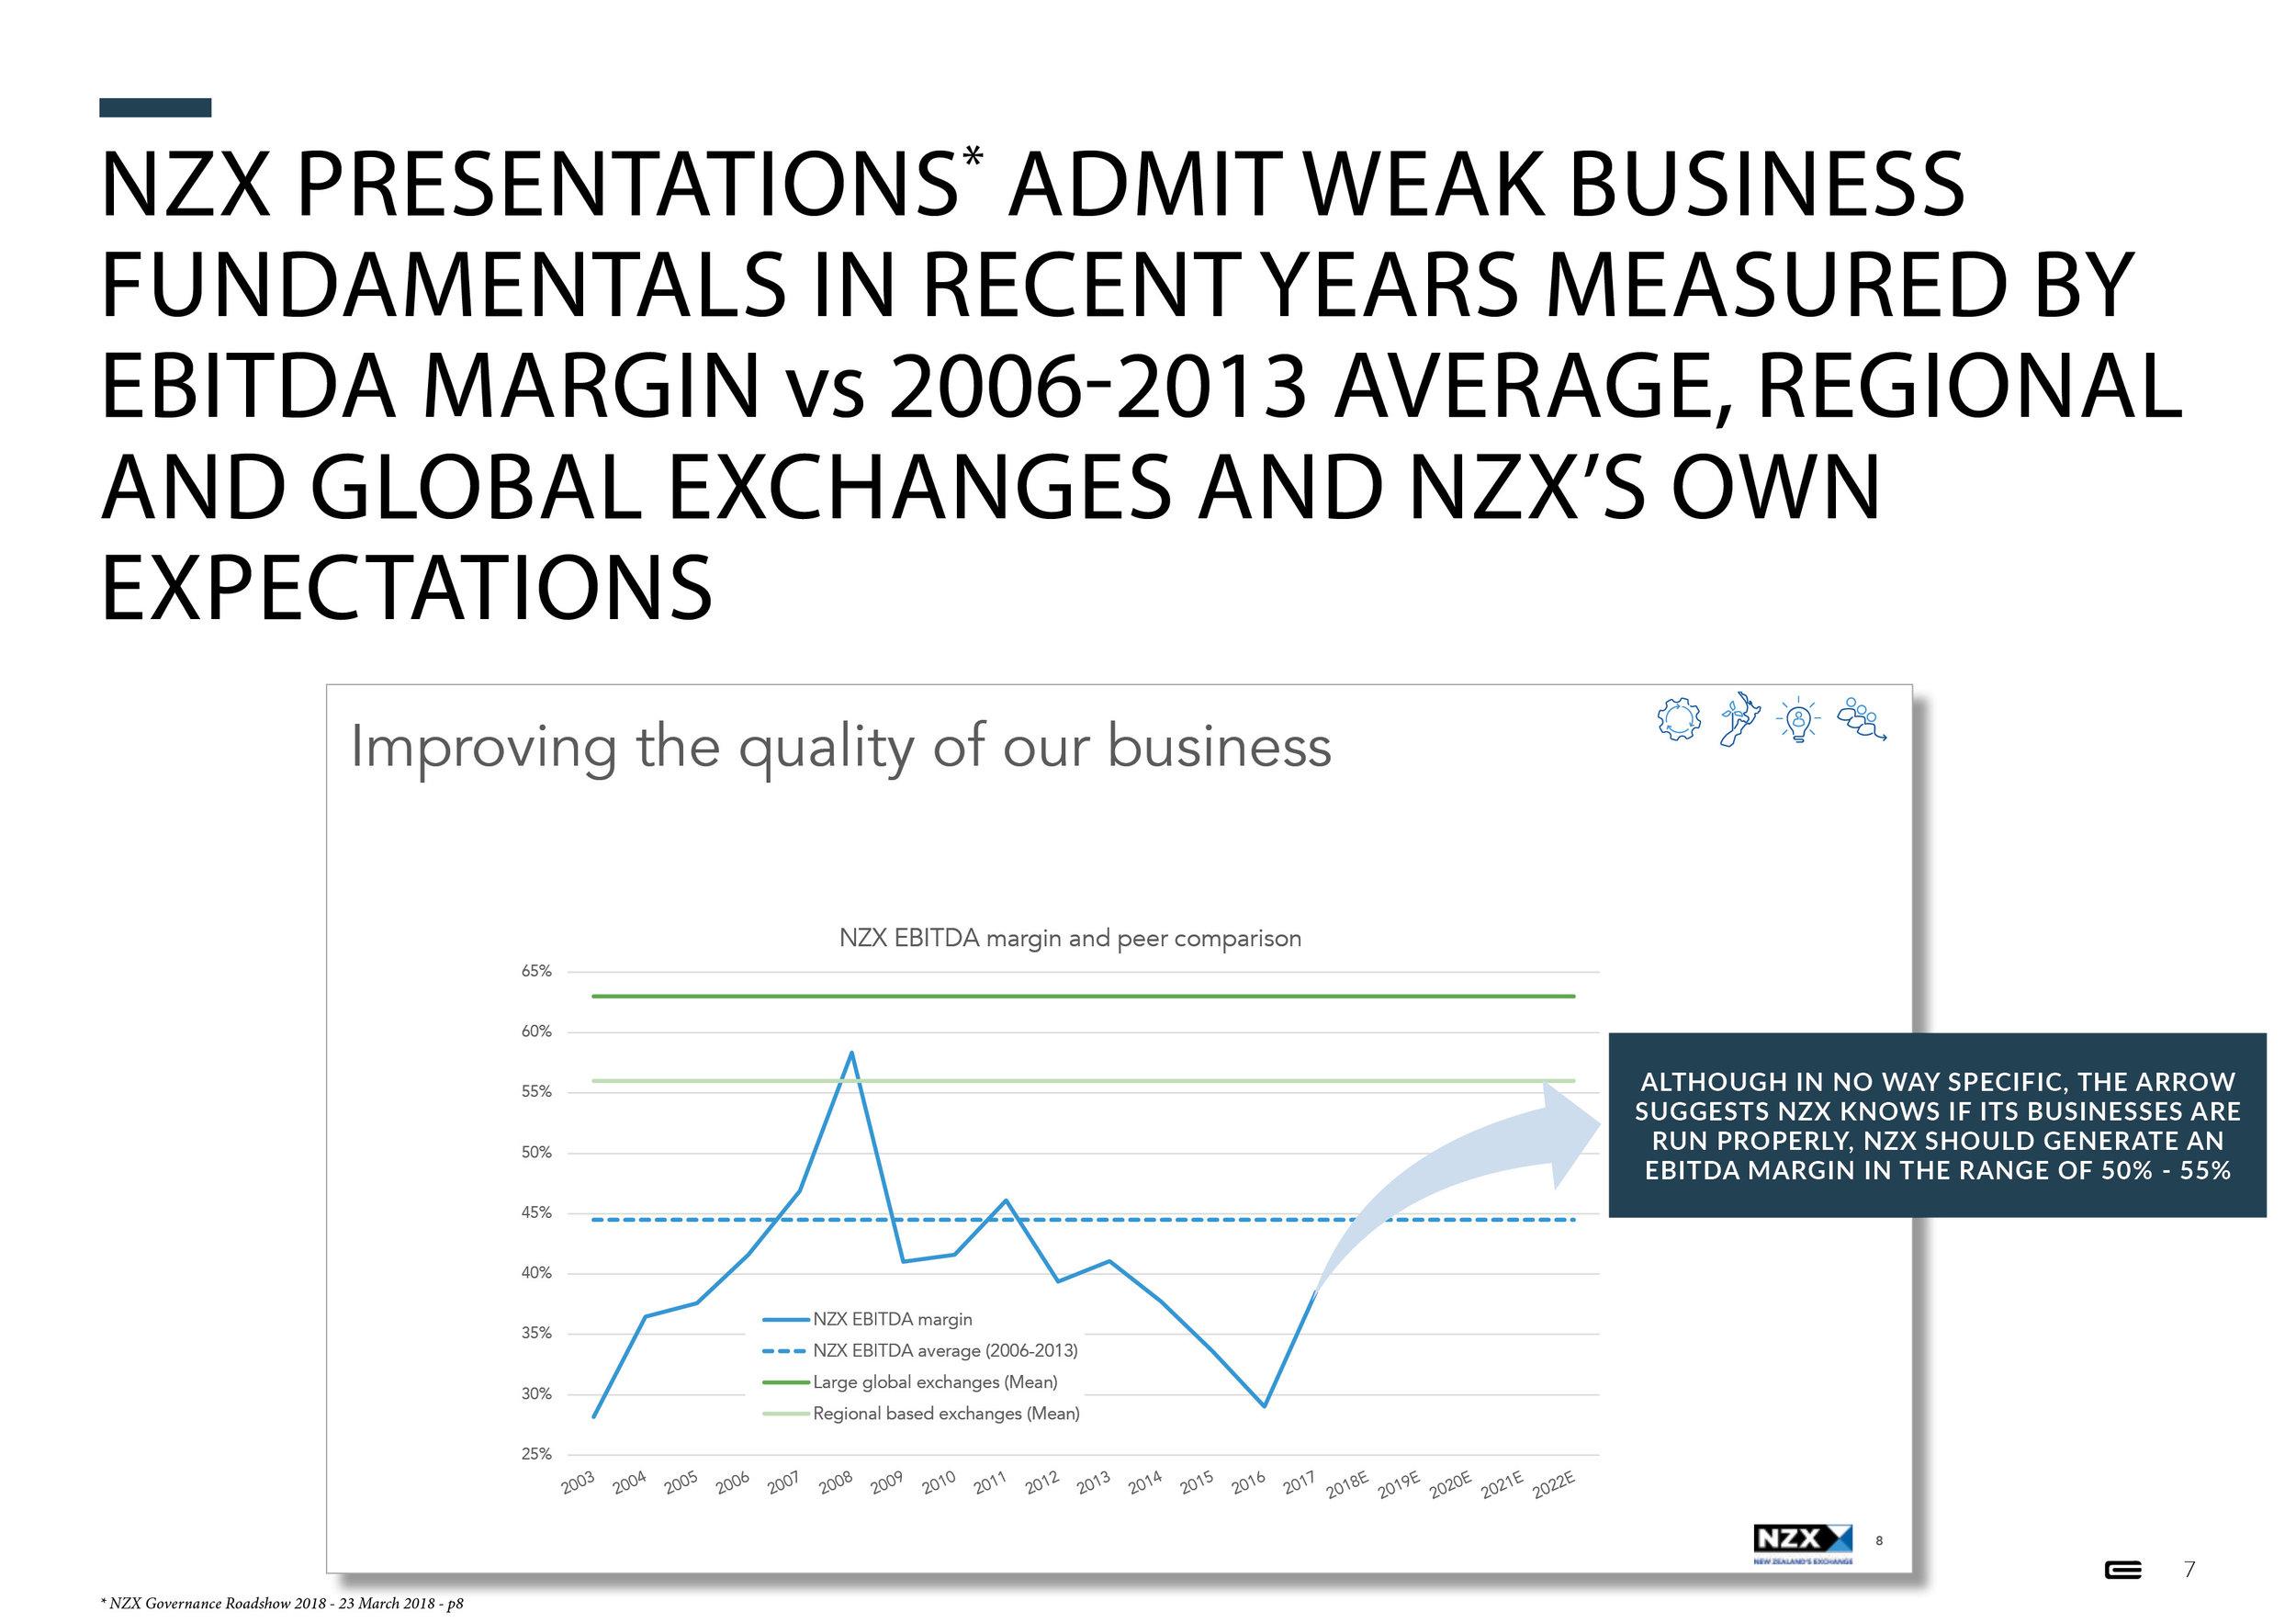 #NZXNOW - Presentation - 1 October 20187.jpg